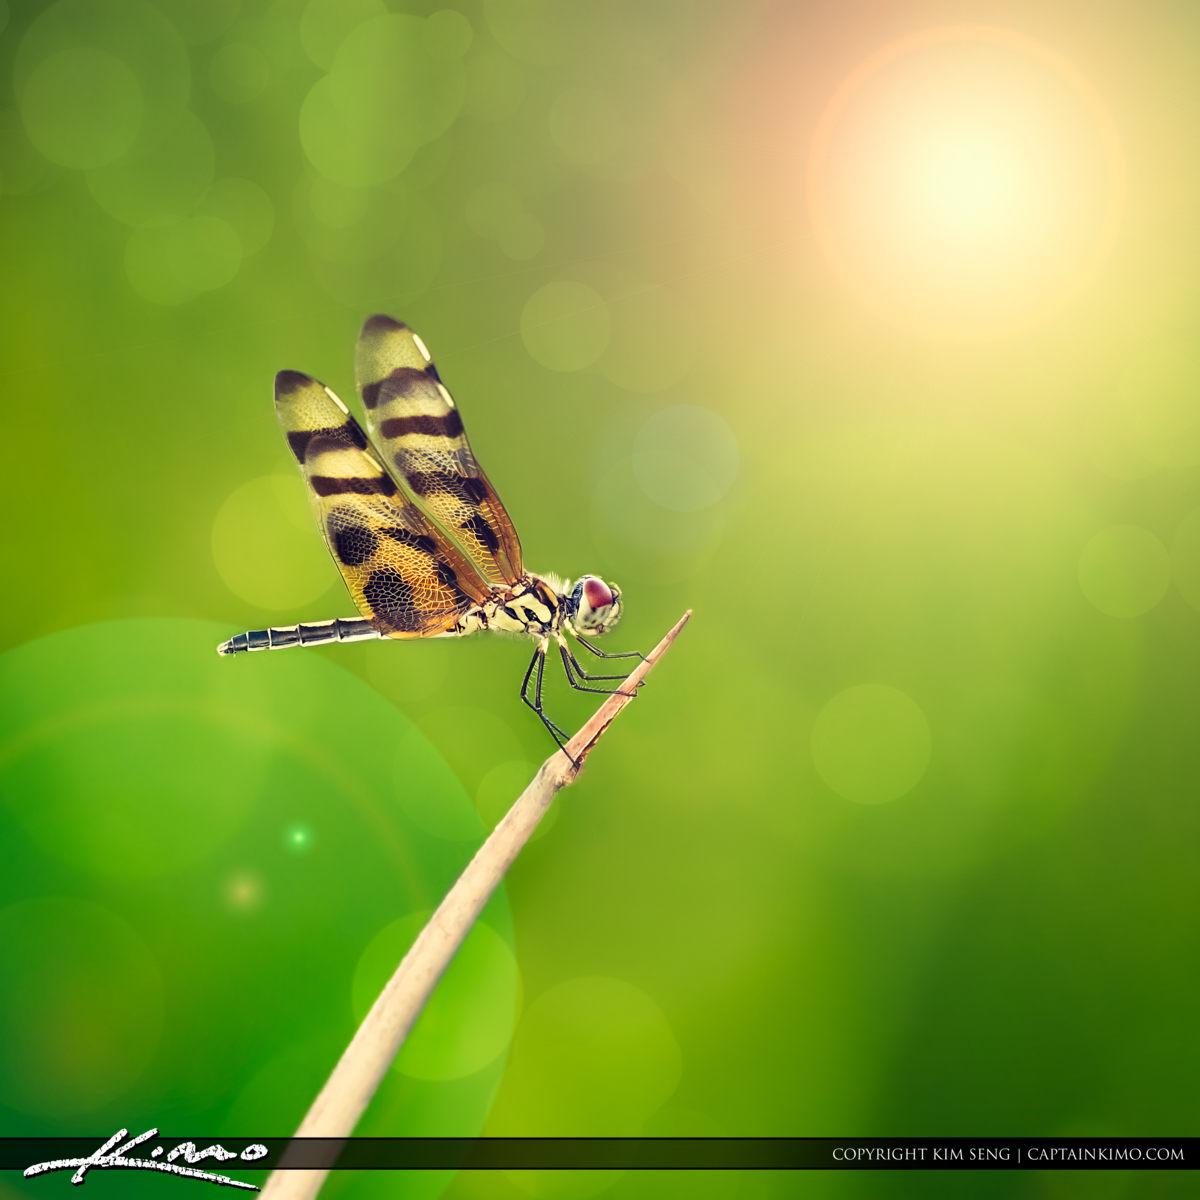 Dragonfly Green Bokeh Background Photo Art